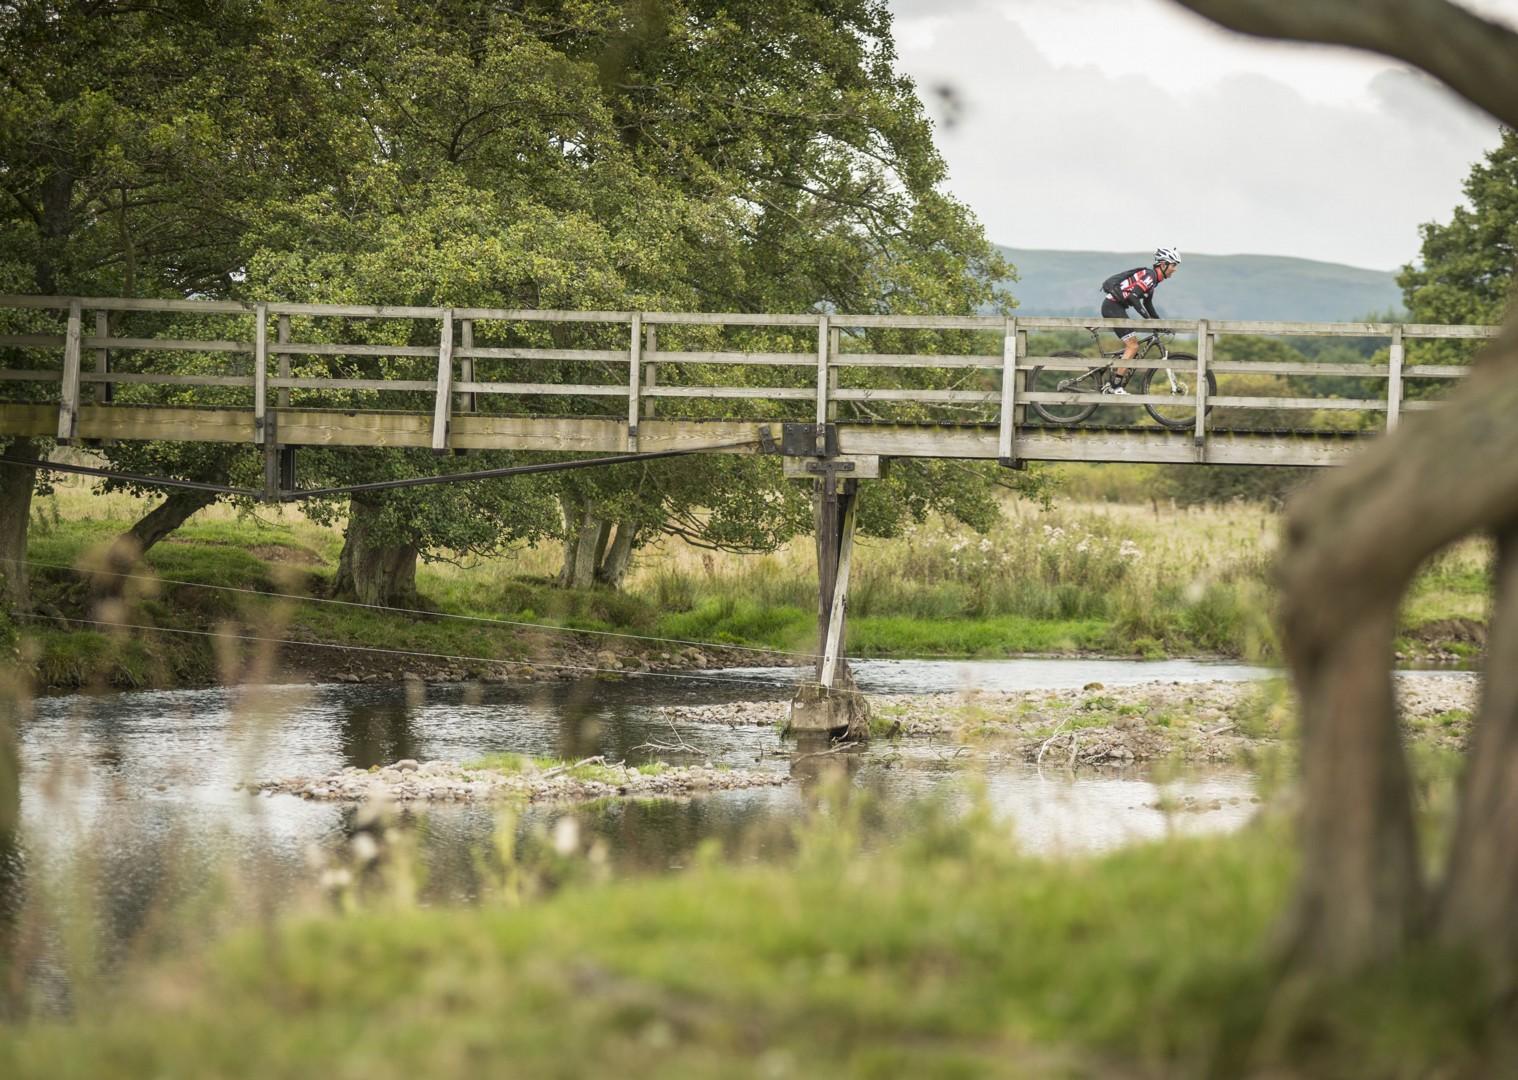 sandstone-way-rothwell-178.jpg - UK - Northumberland - Sandstone Way - Mountain Biking